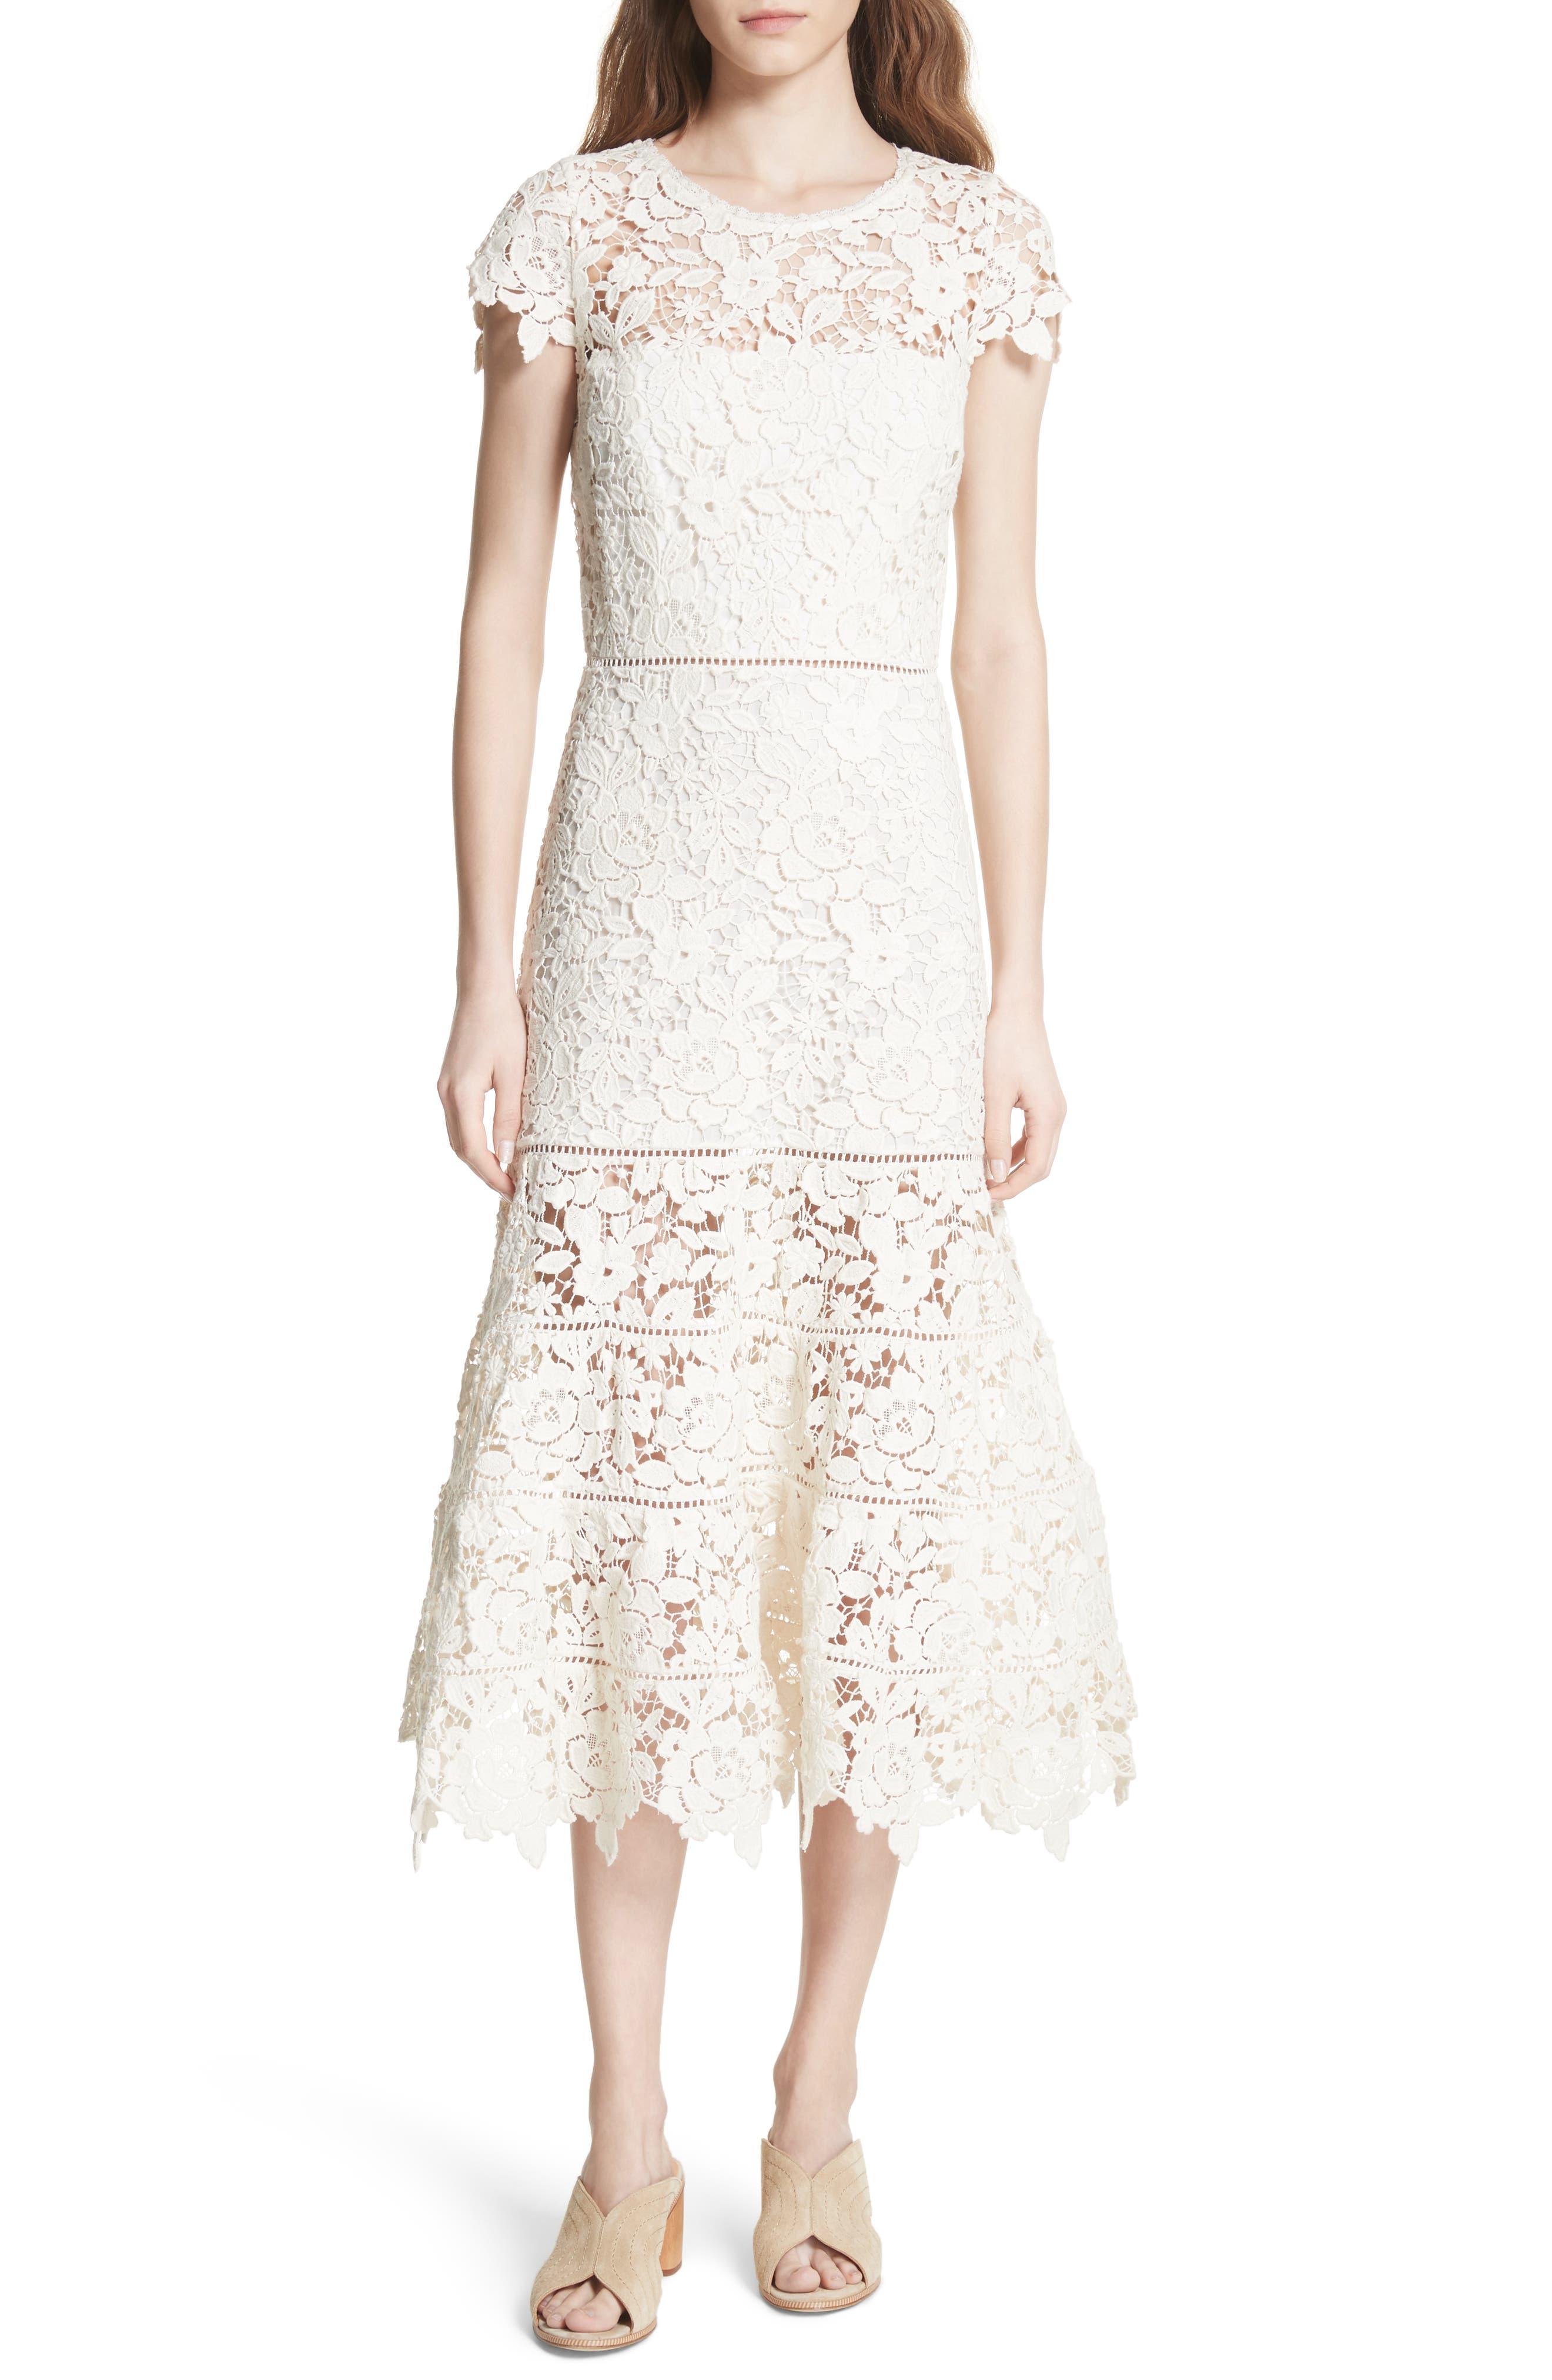 Celedonia Scallop Lace Dress,                             Main thumbnail 1, color,                             120